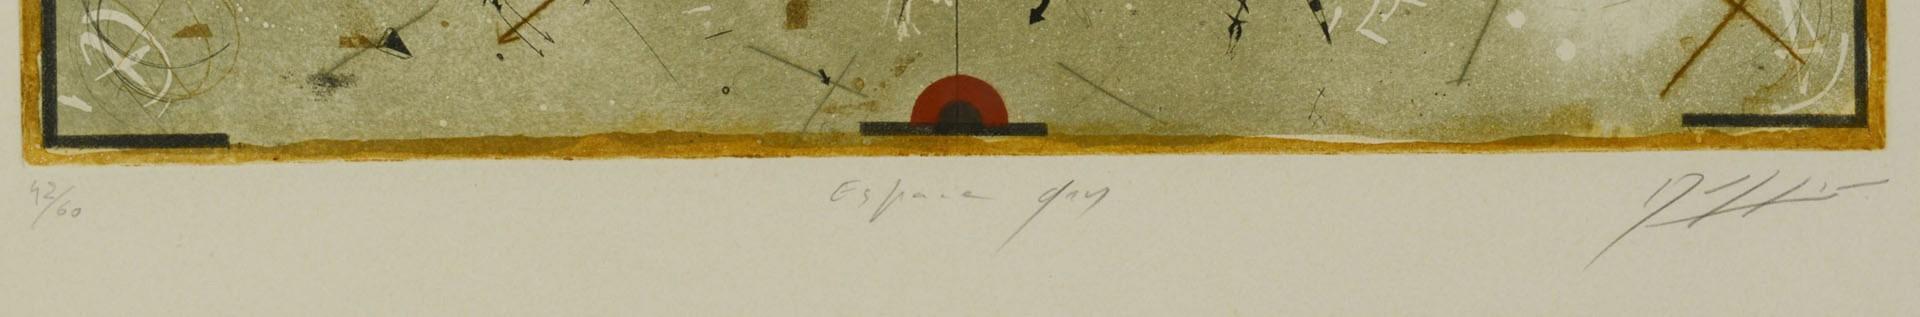 Lot 2872265: 3 Georges Dussau Colored Engravings